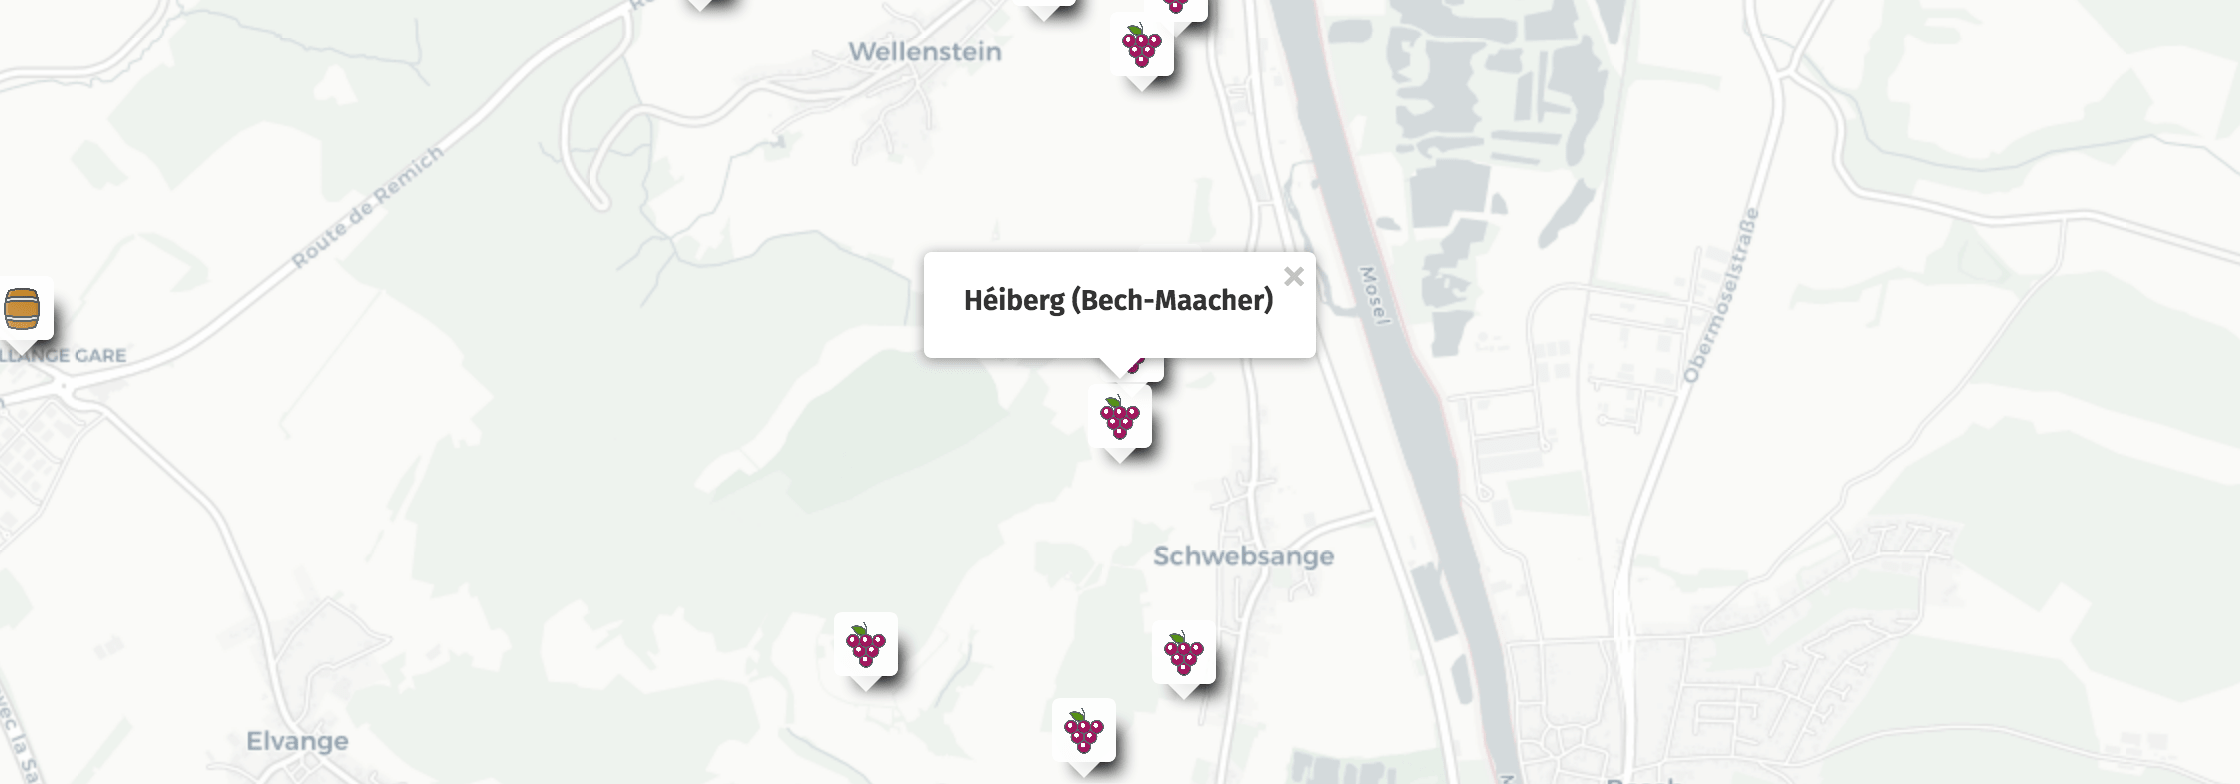 Geolocalisation des vins du Héiberg à Bech-Kleinmacher